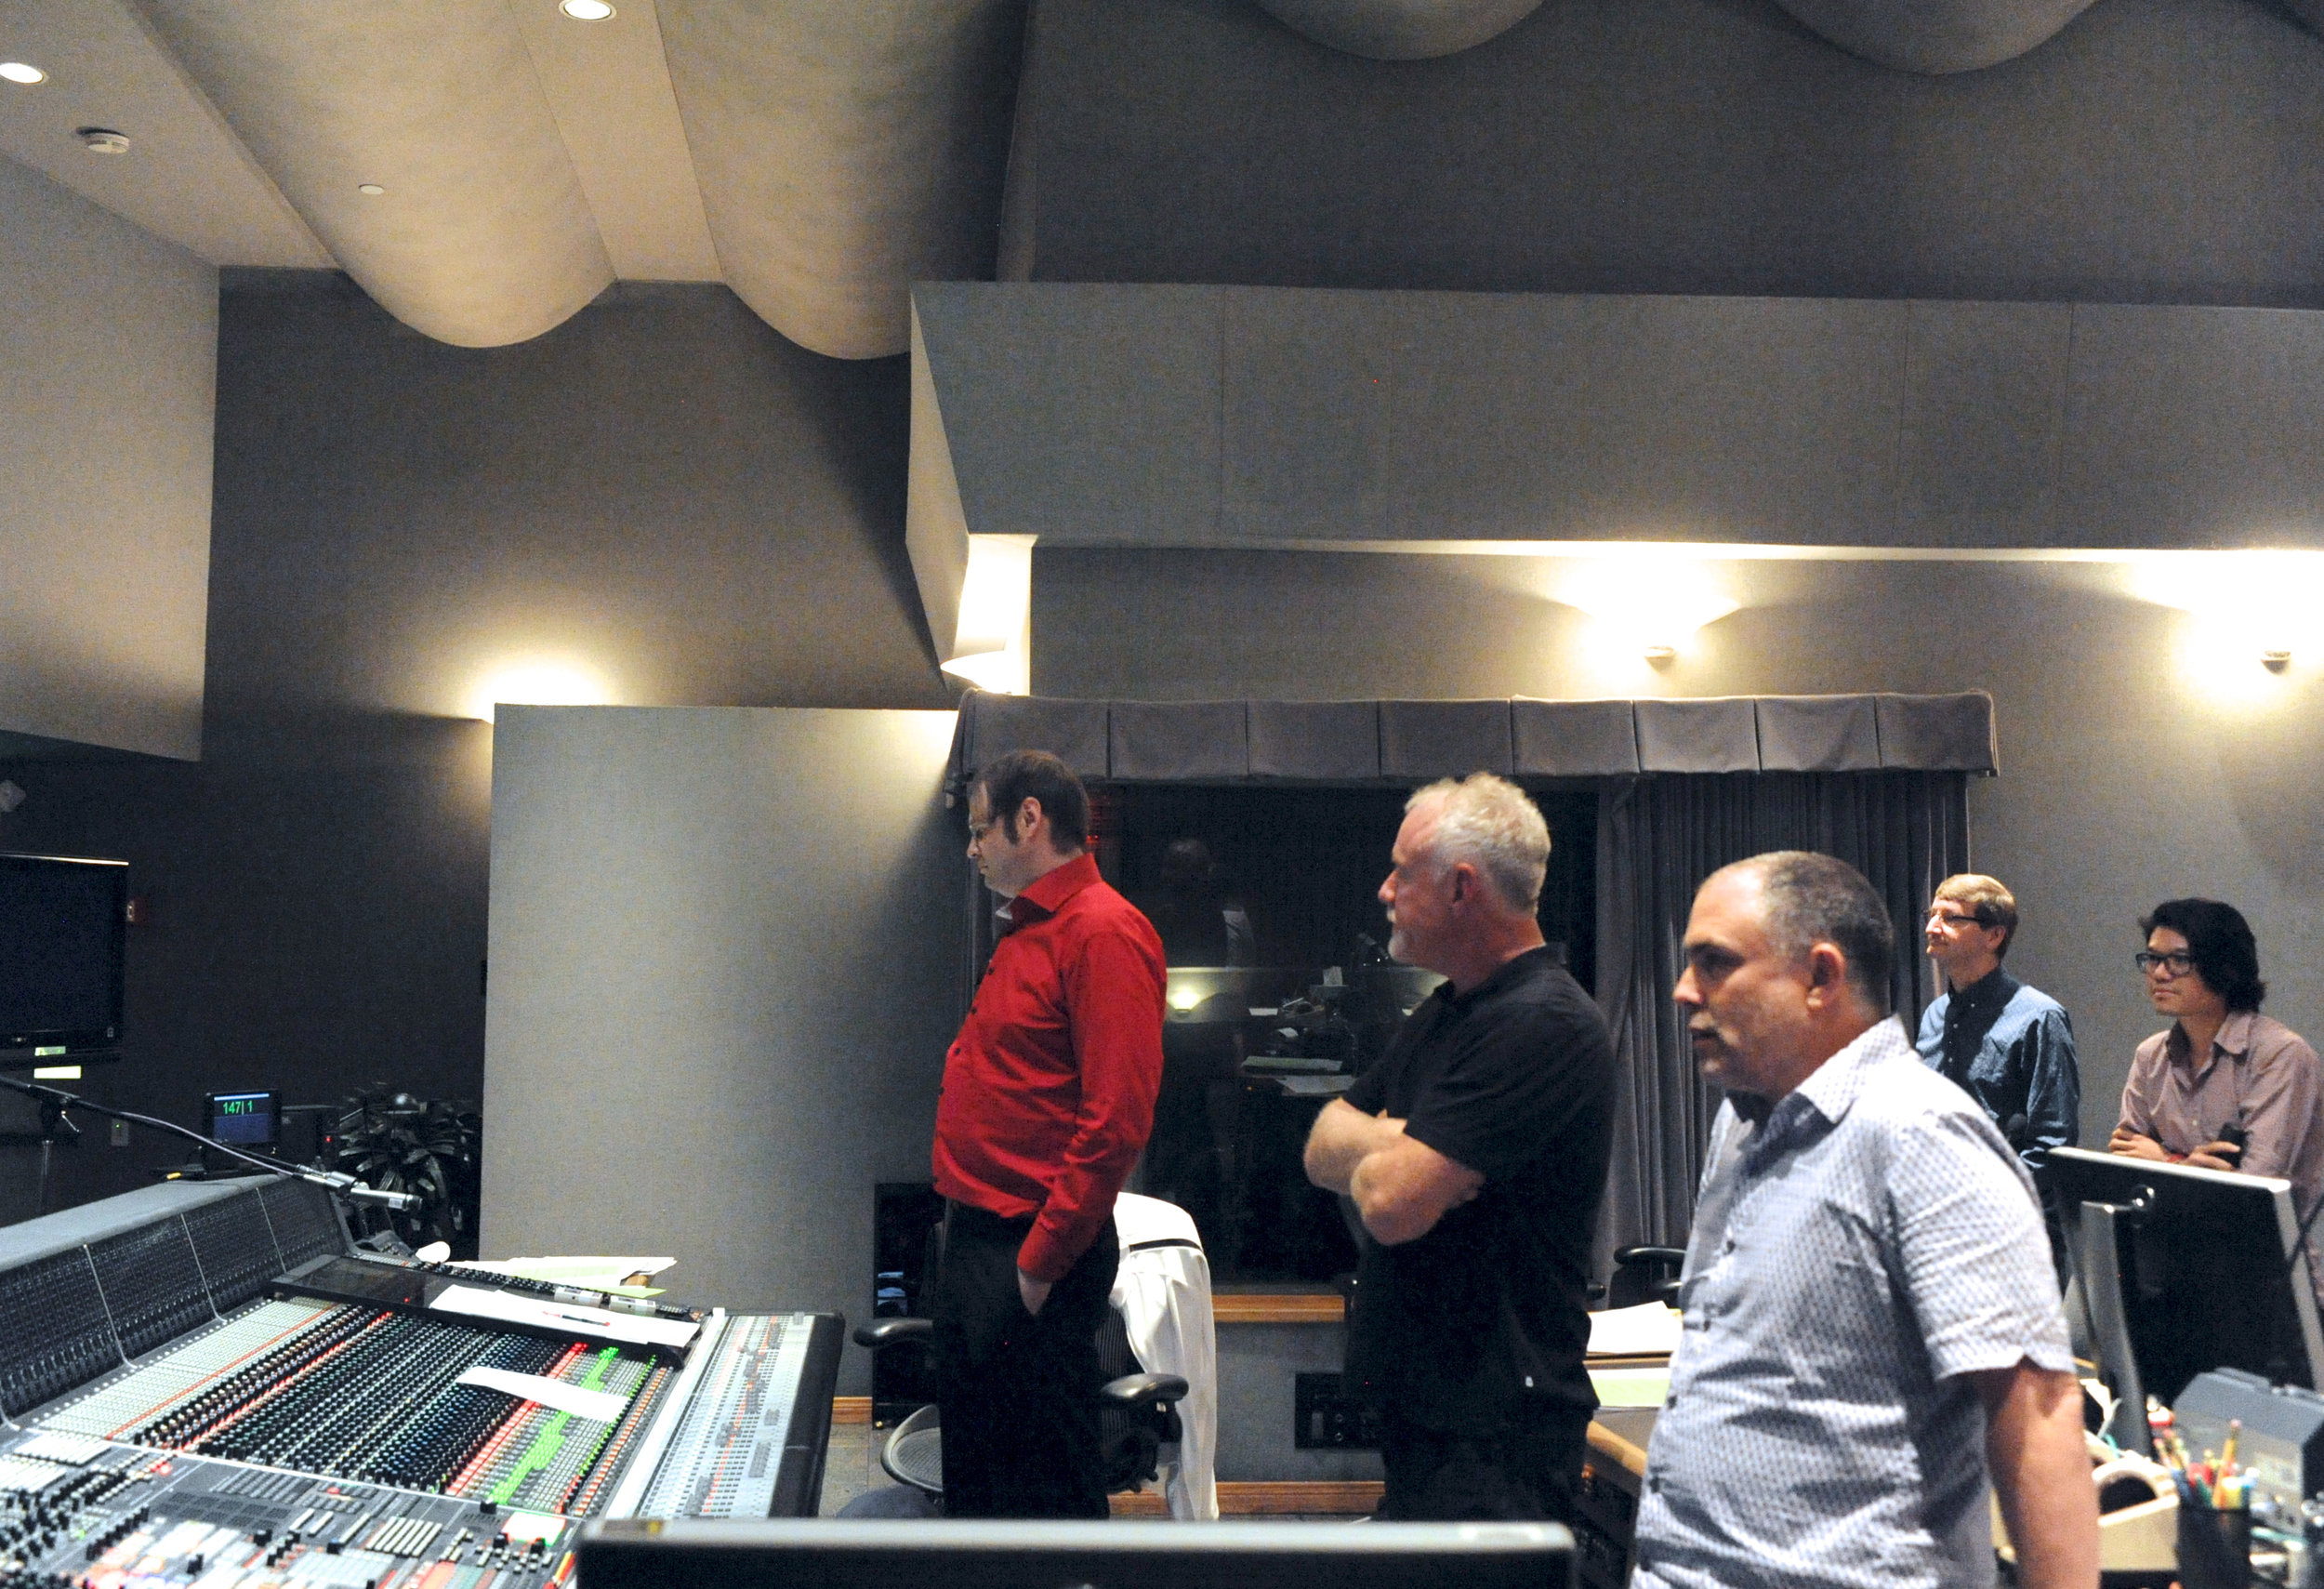 Kaska and John Debney at Sony During Playback